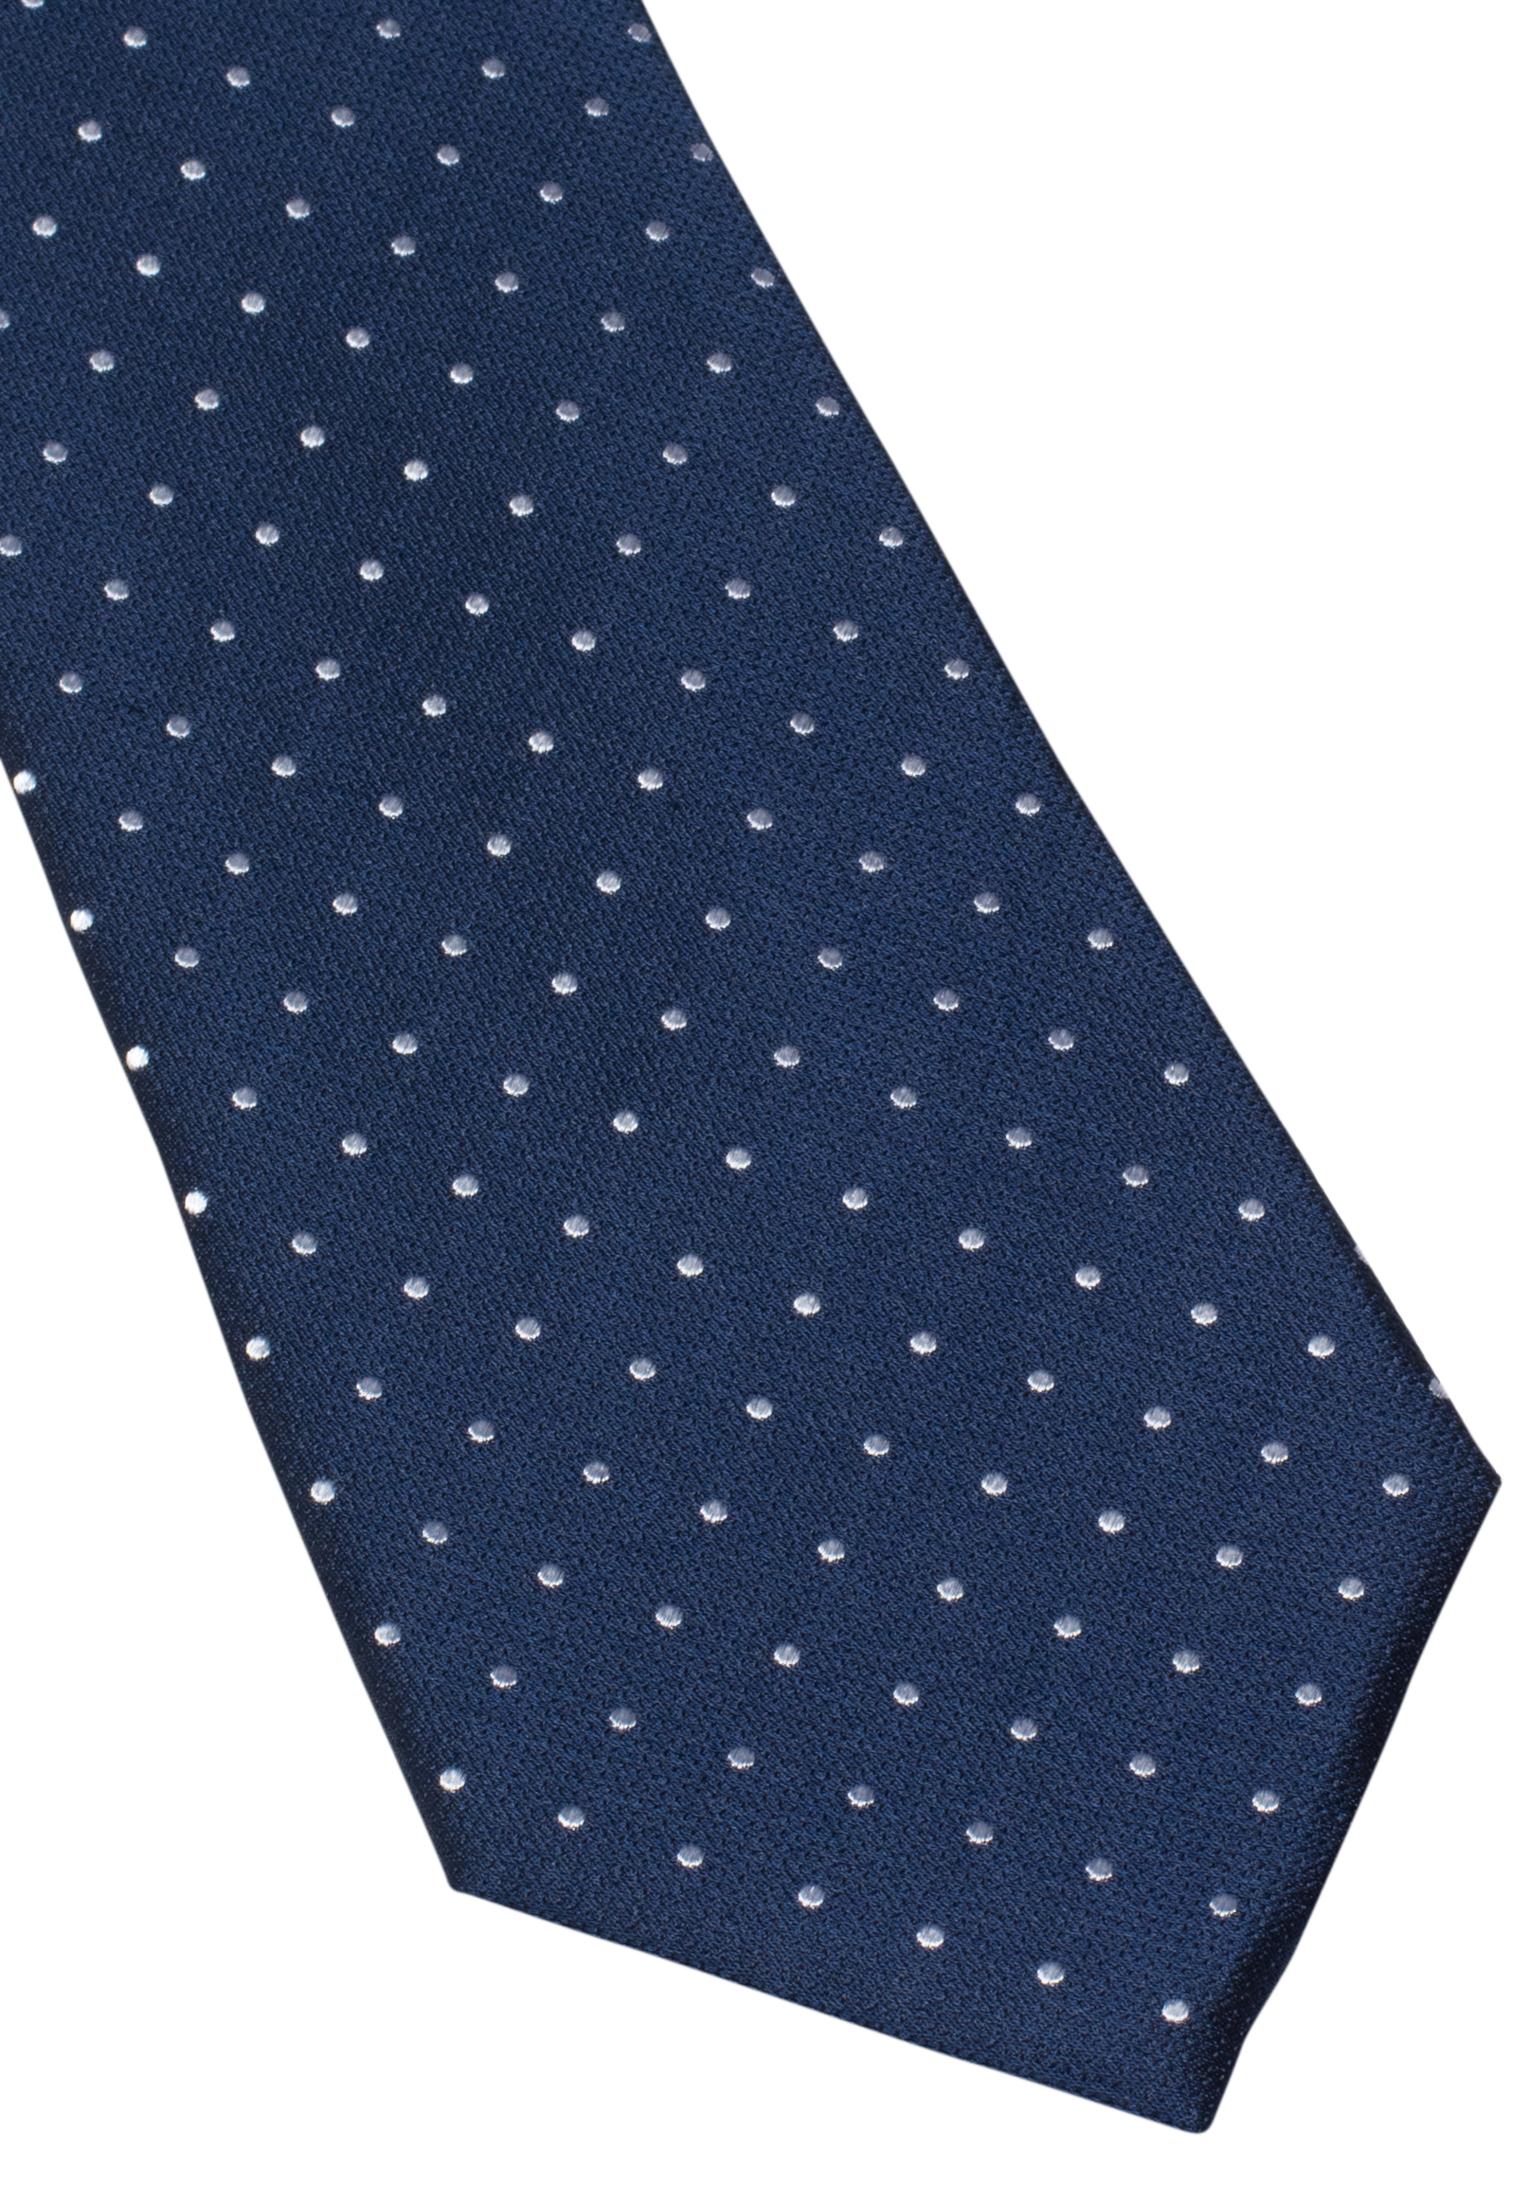 ETERNA 9026 Krawatte Seide marineblau/ weiss